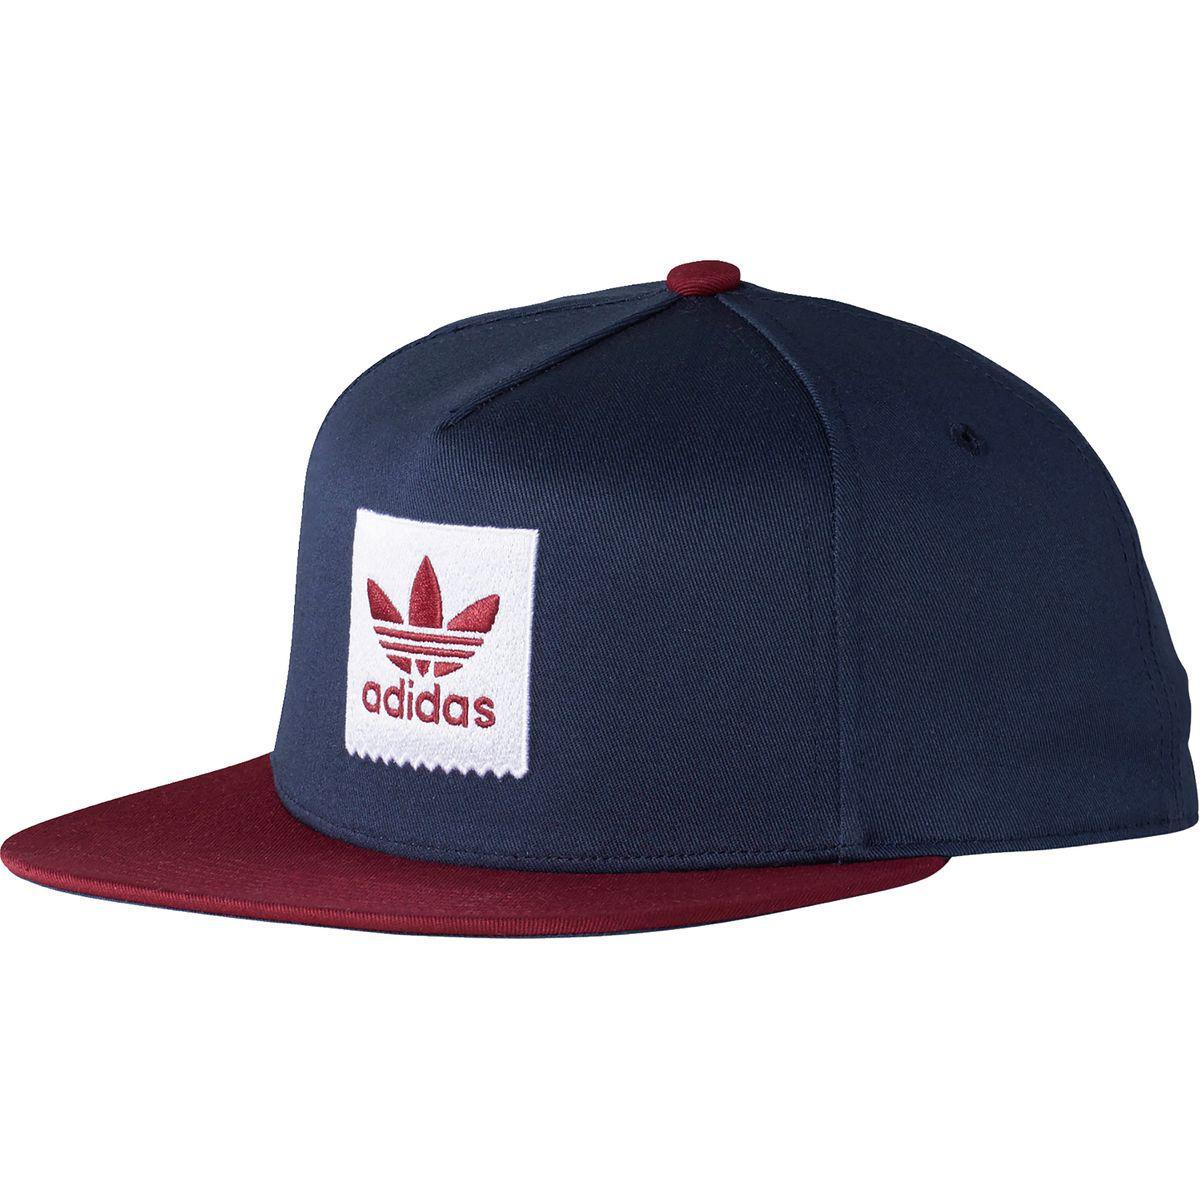 4a35924438c0c adidas Two Tone Blackbird Snapback Hat in Blue for Men - Lyst